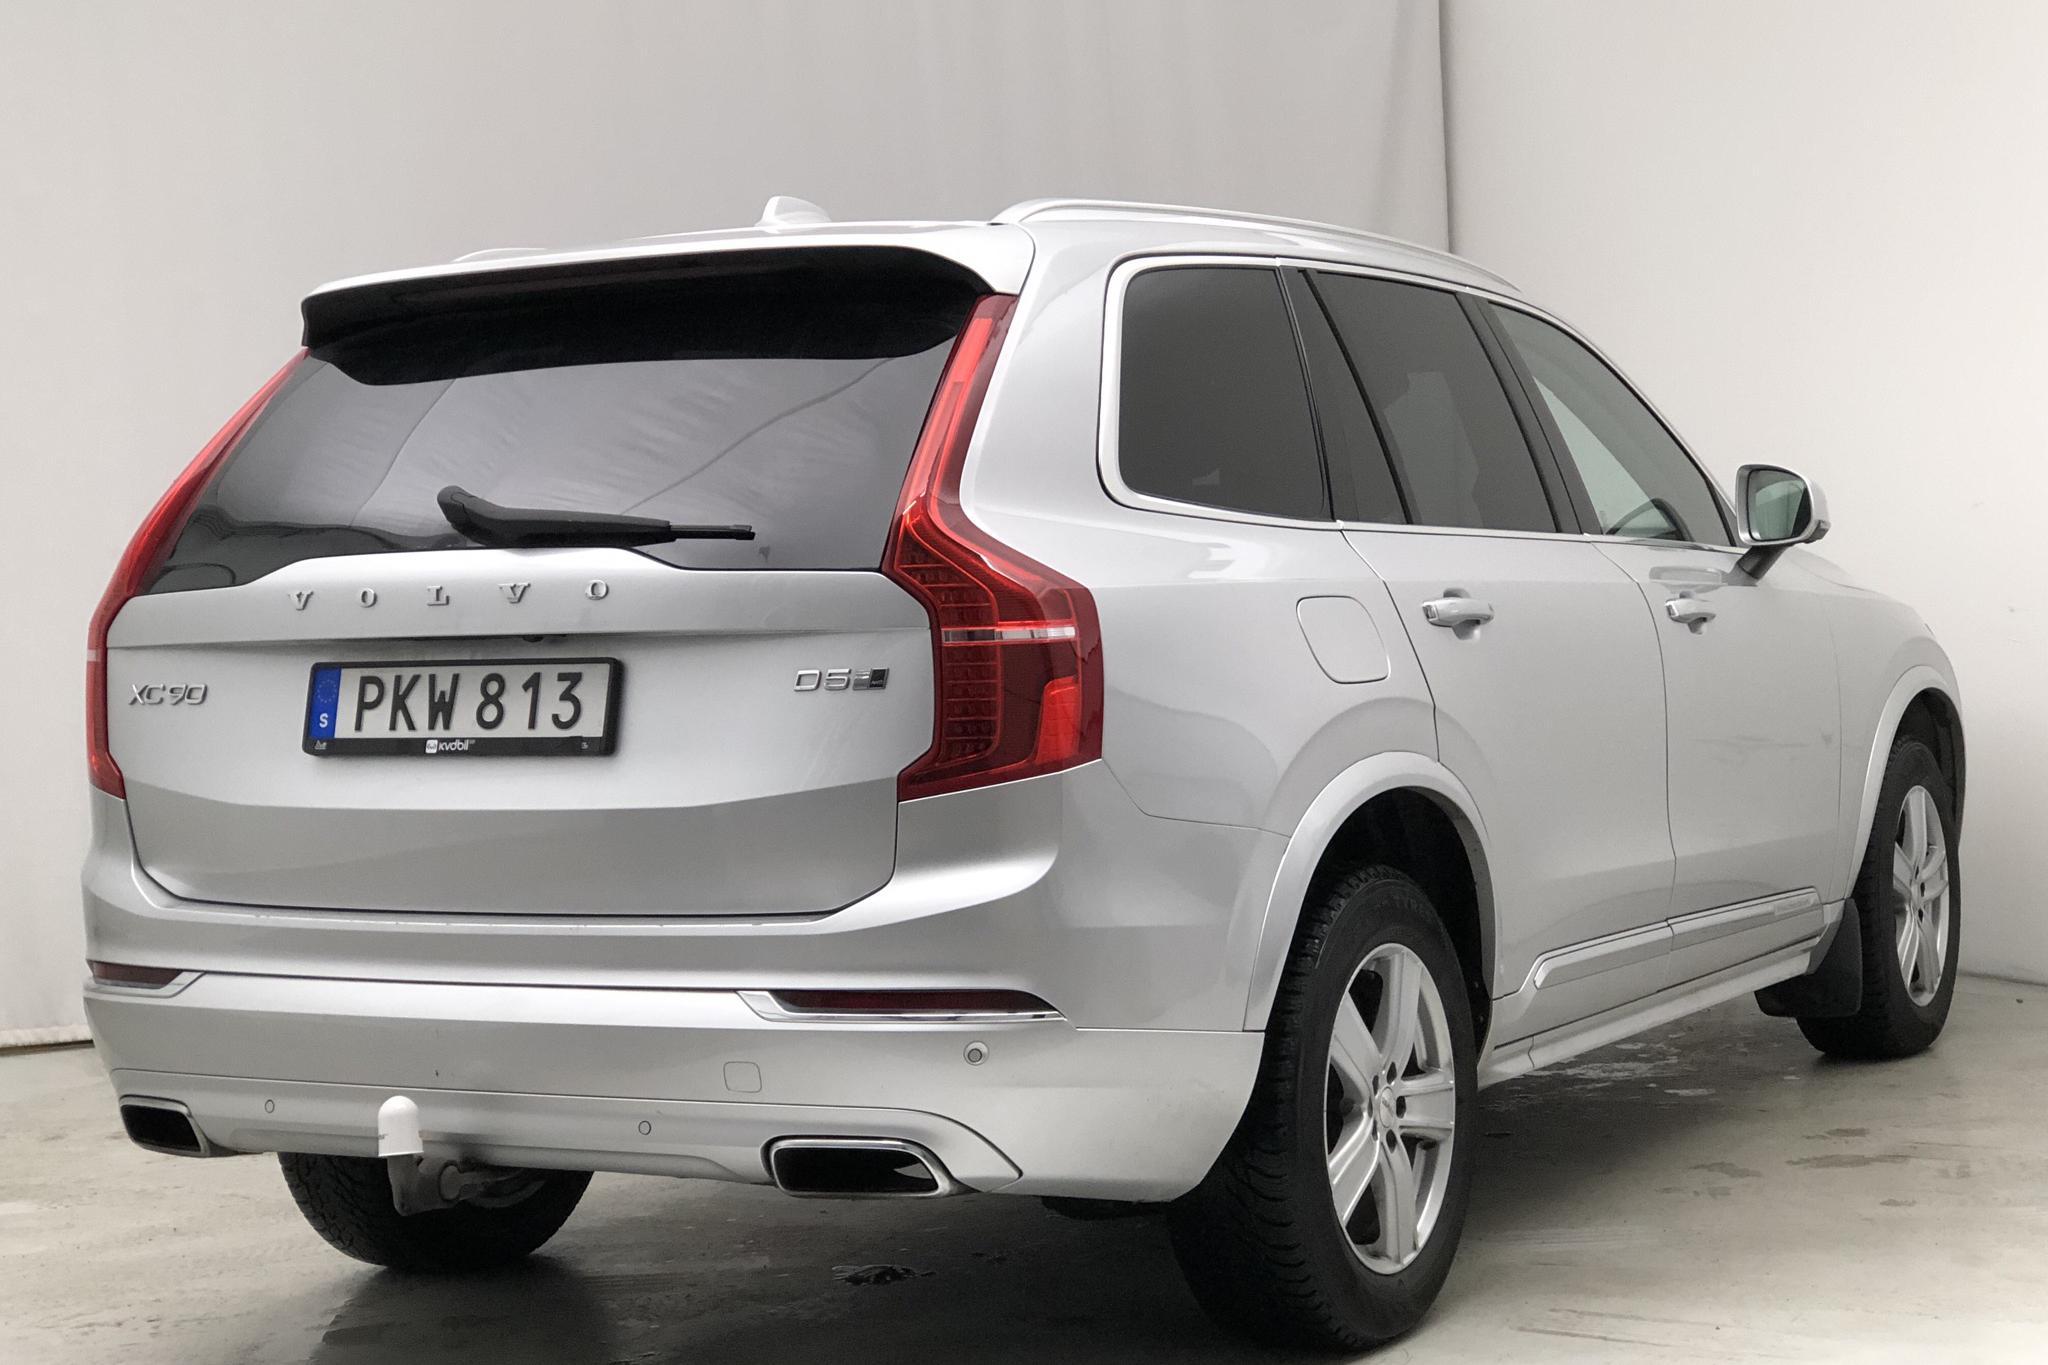 Volvo XC90 D5 AWD (235hk) - 14 825 mil - Automat - silver - 2018